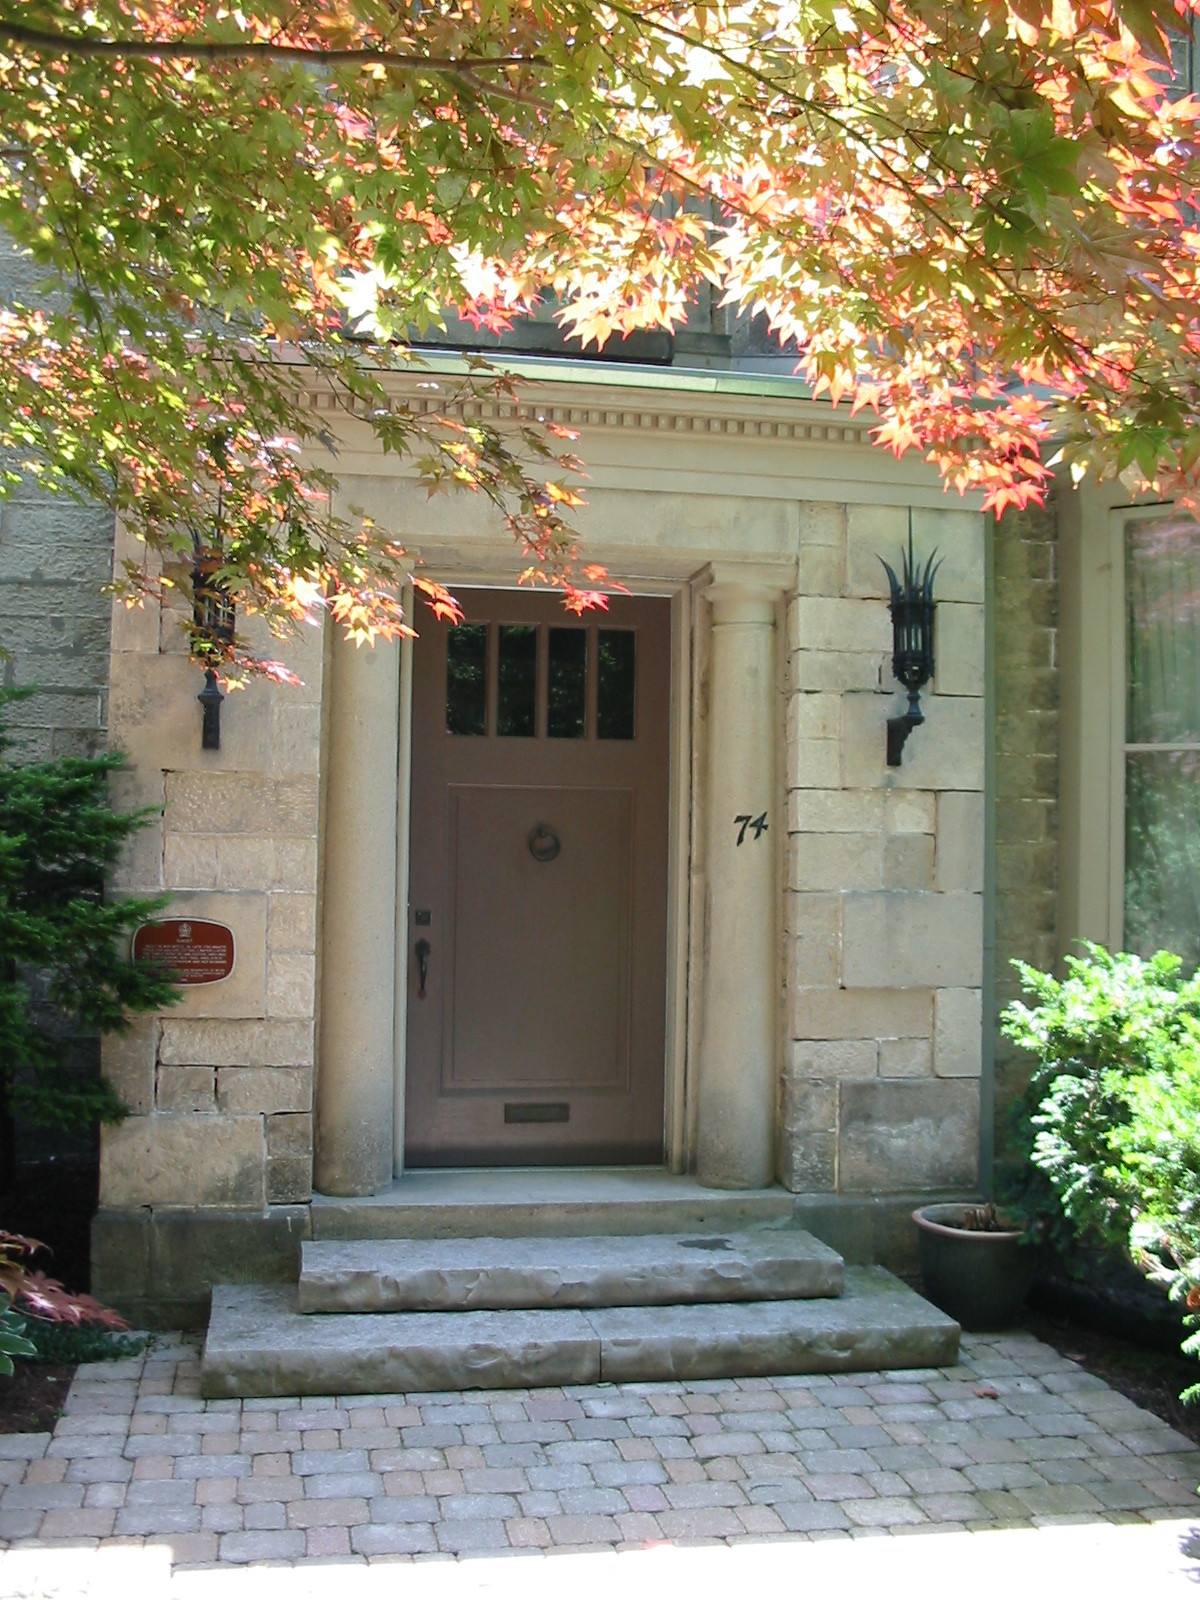 Wondrous Steps And Entrances Robin Aggus Natural Landscaping Largest Home Design Picture Inspirations Pitcheantrous